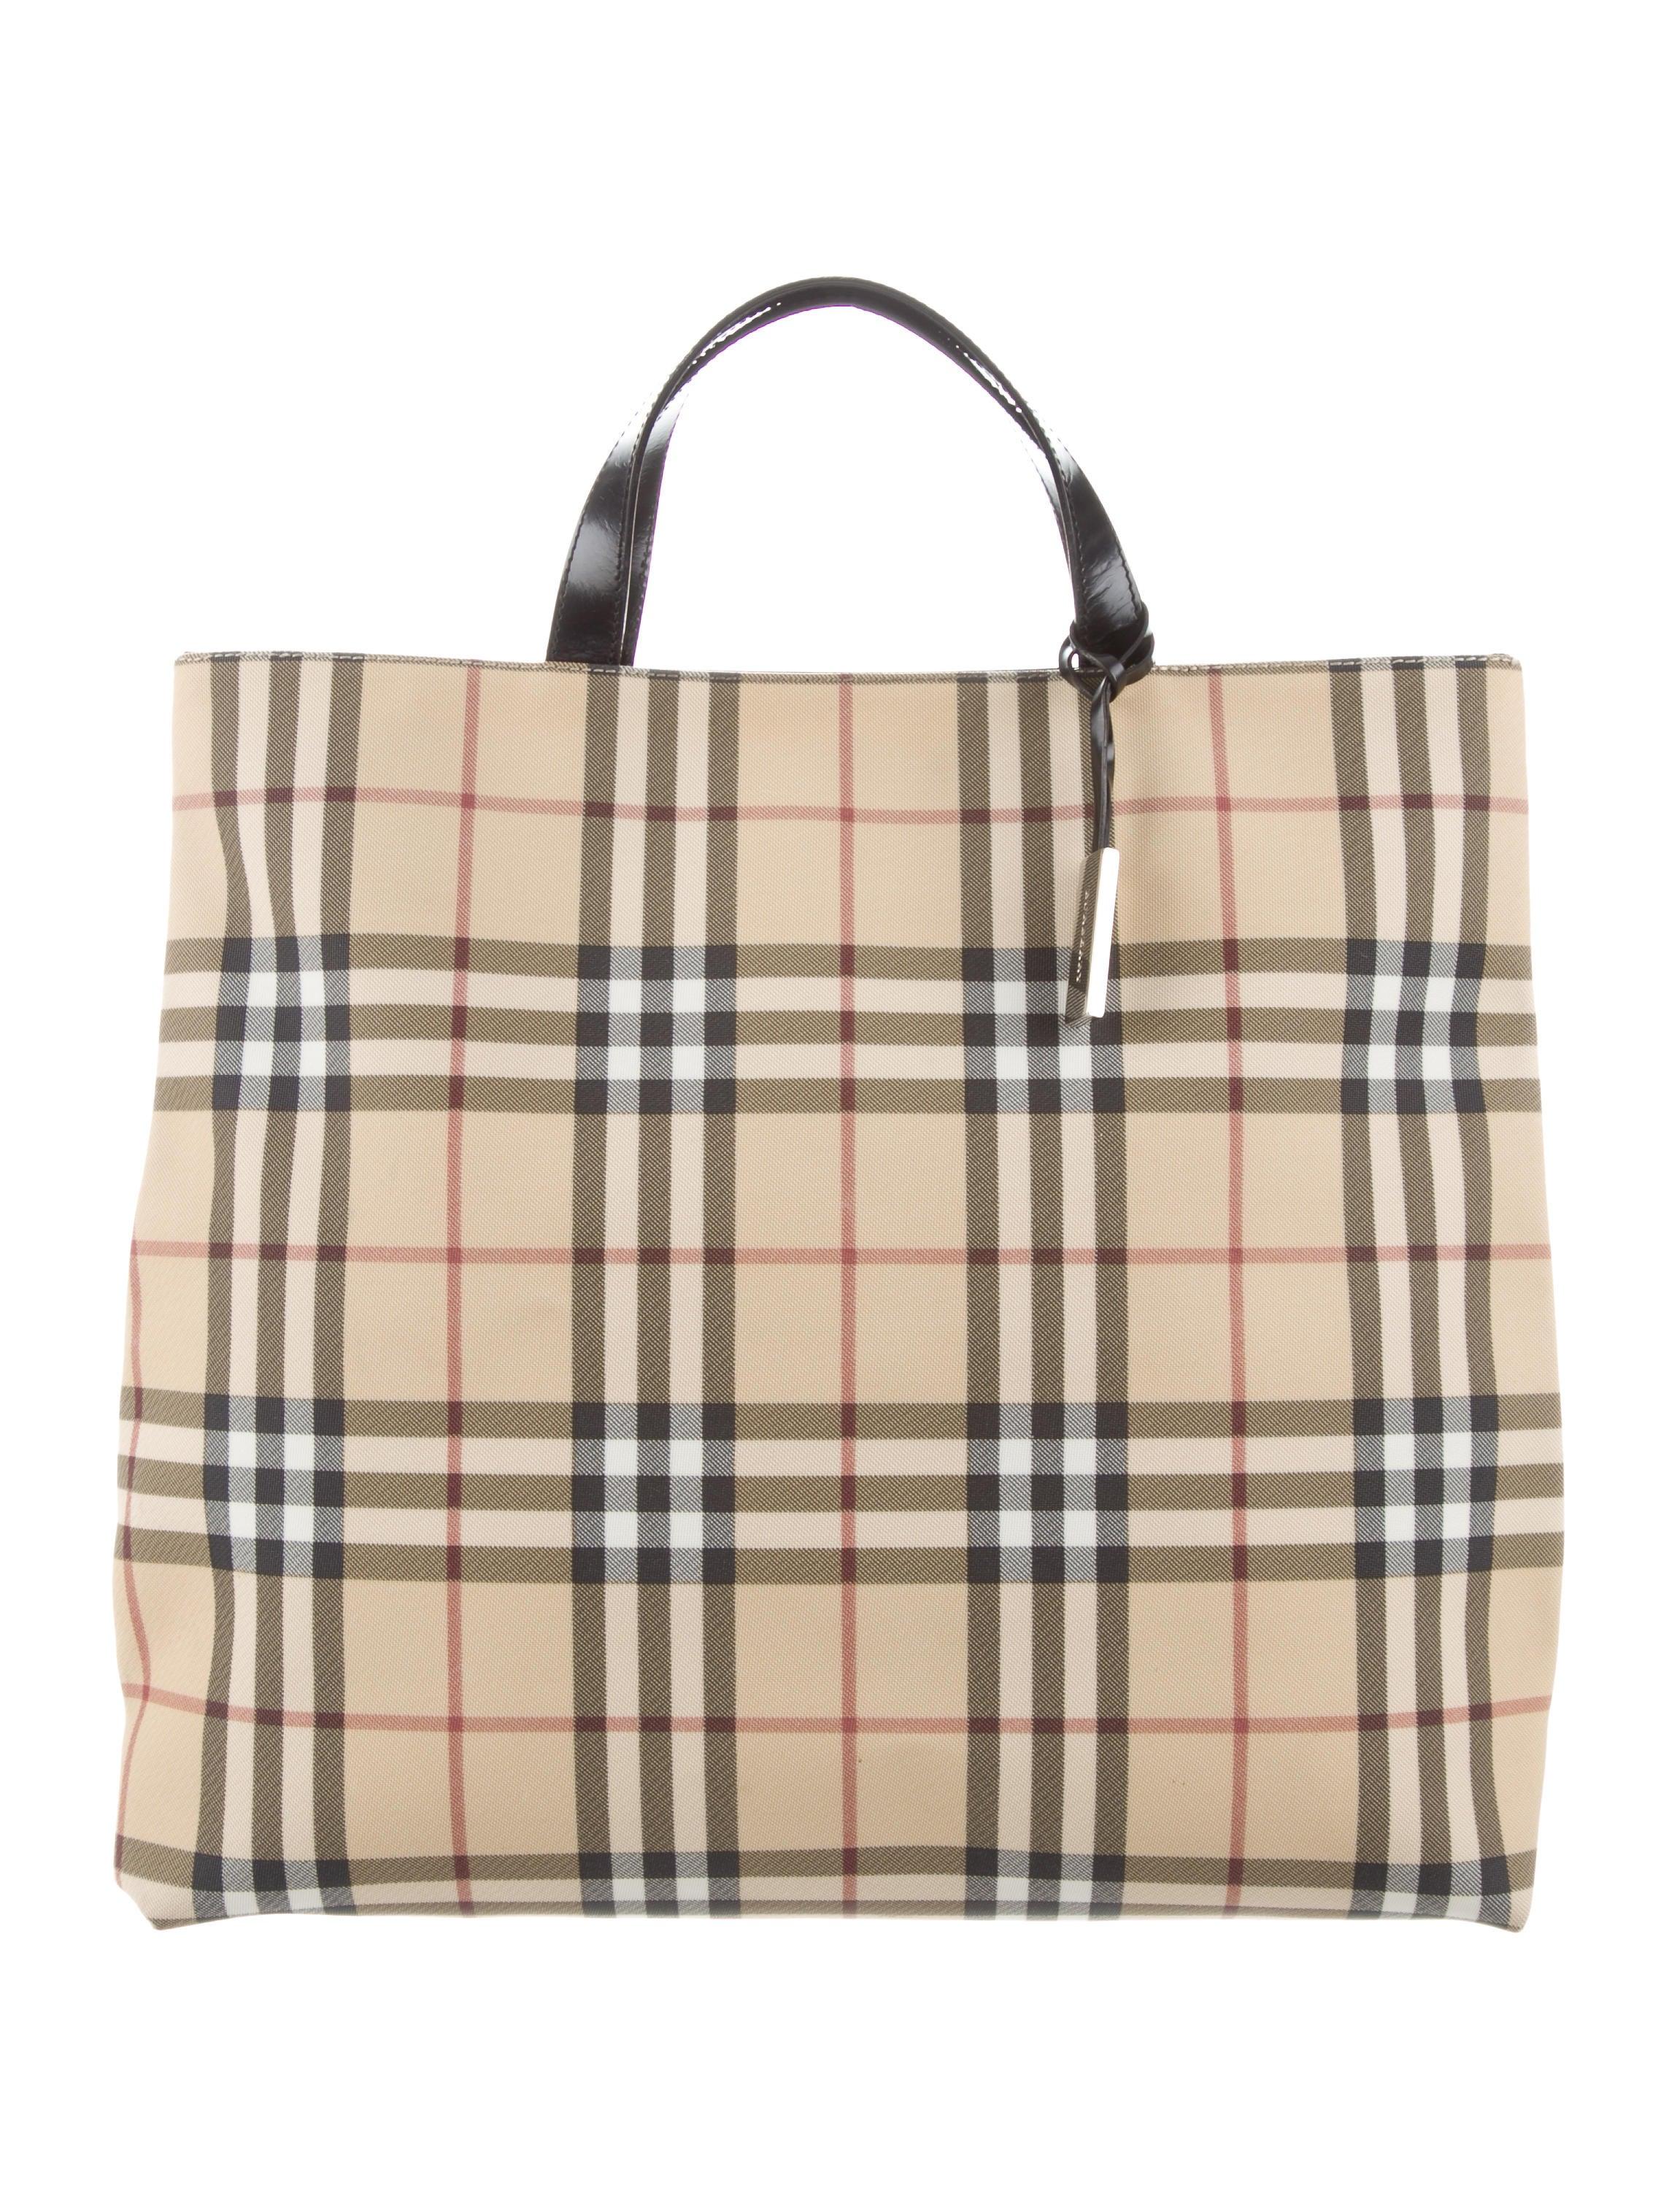 0d6be9772563 Burberry London Nova Check Tote - Handbags - WBURL36389